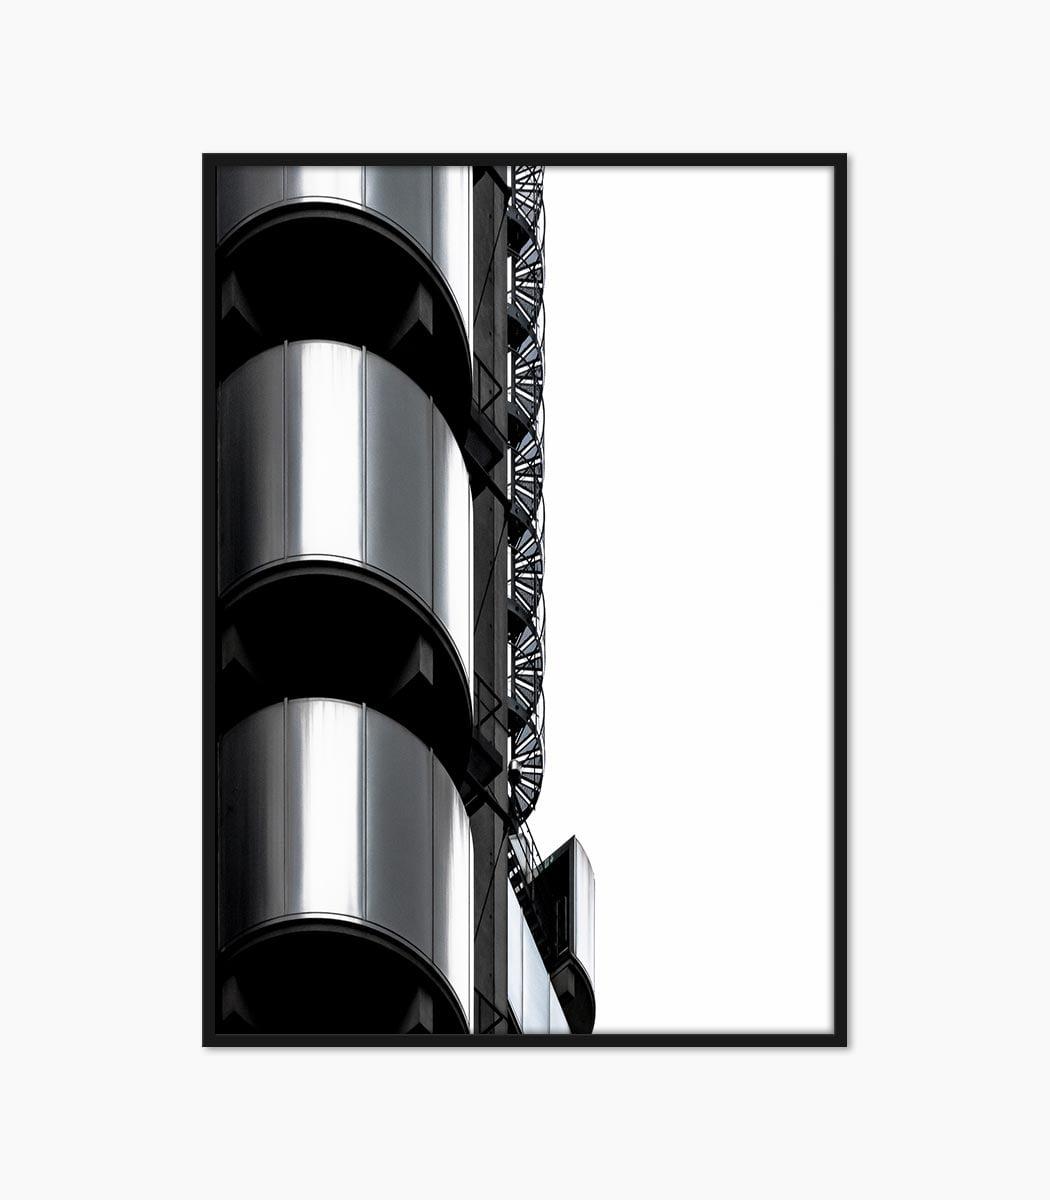 print fotografie urbana creata si printata la calitate superioara numai pe www.artwall.ro